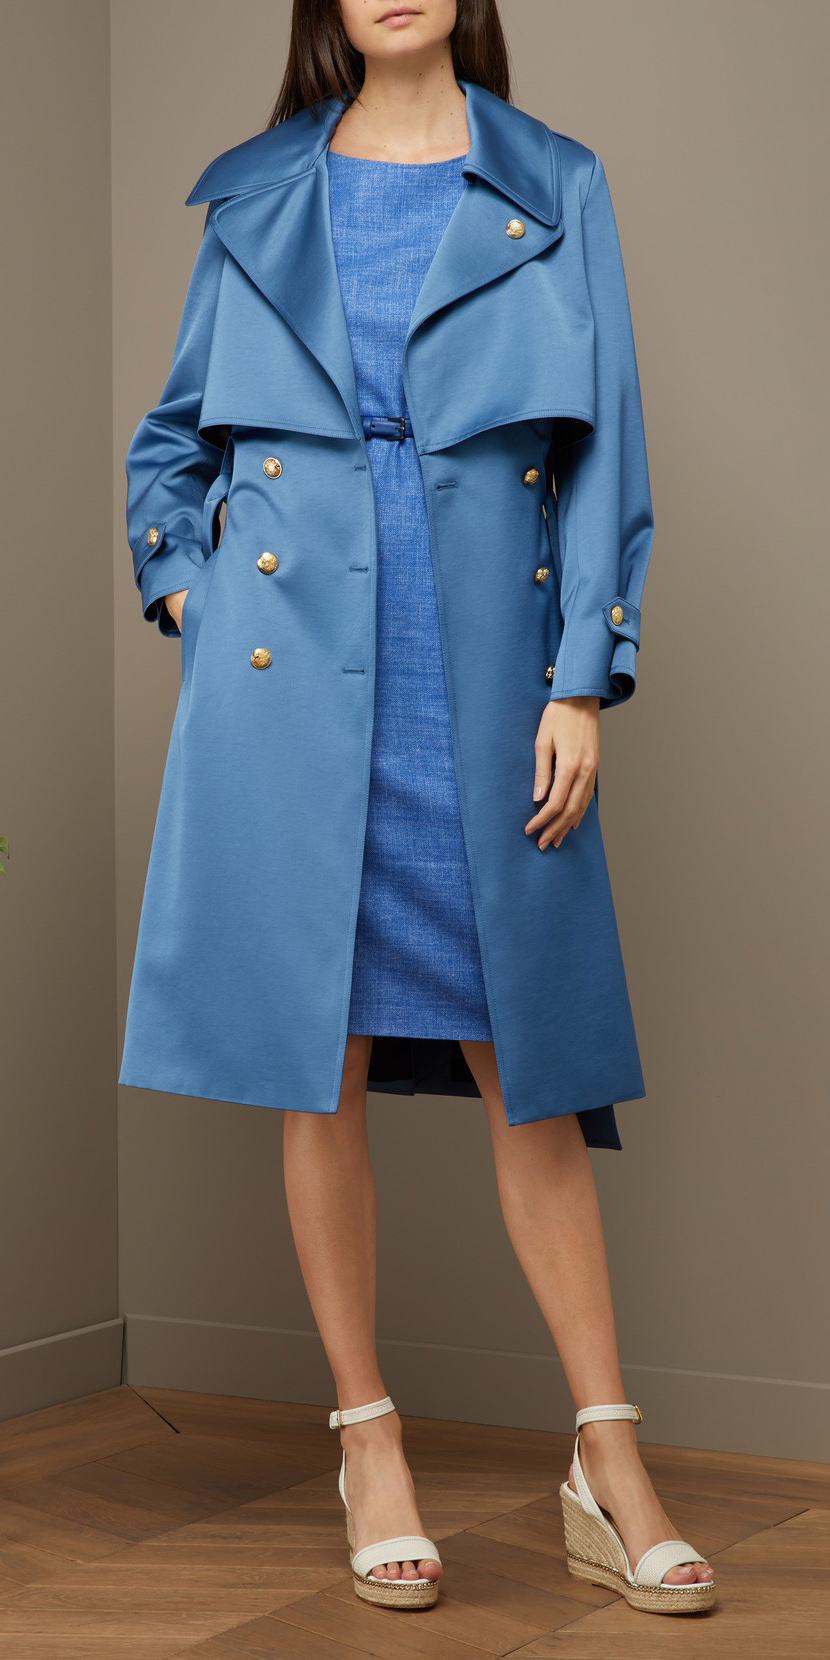 blue-med-dress-shift-white-shoe-sandalw-blue-med-jacket-coat-trench-spring-summer-lunch.jpg